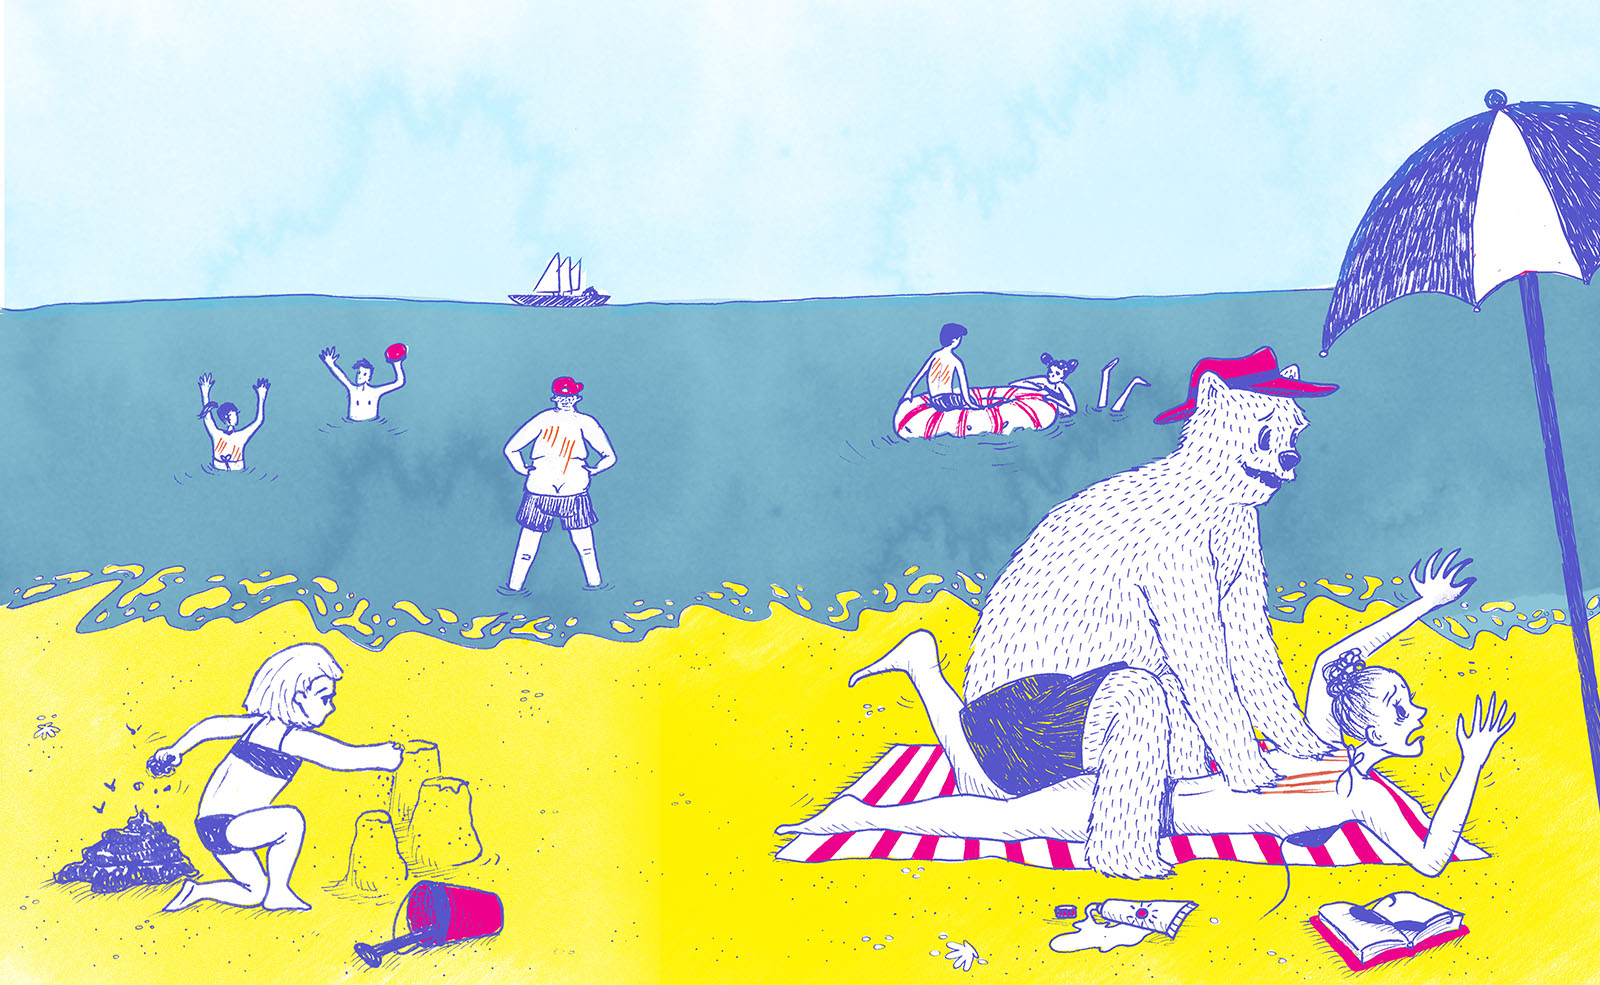 Illustration by Pauline André